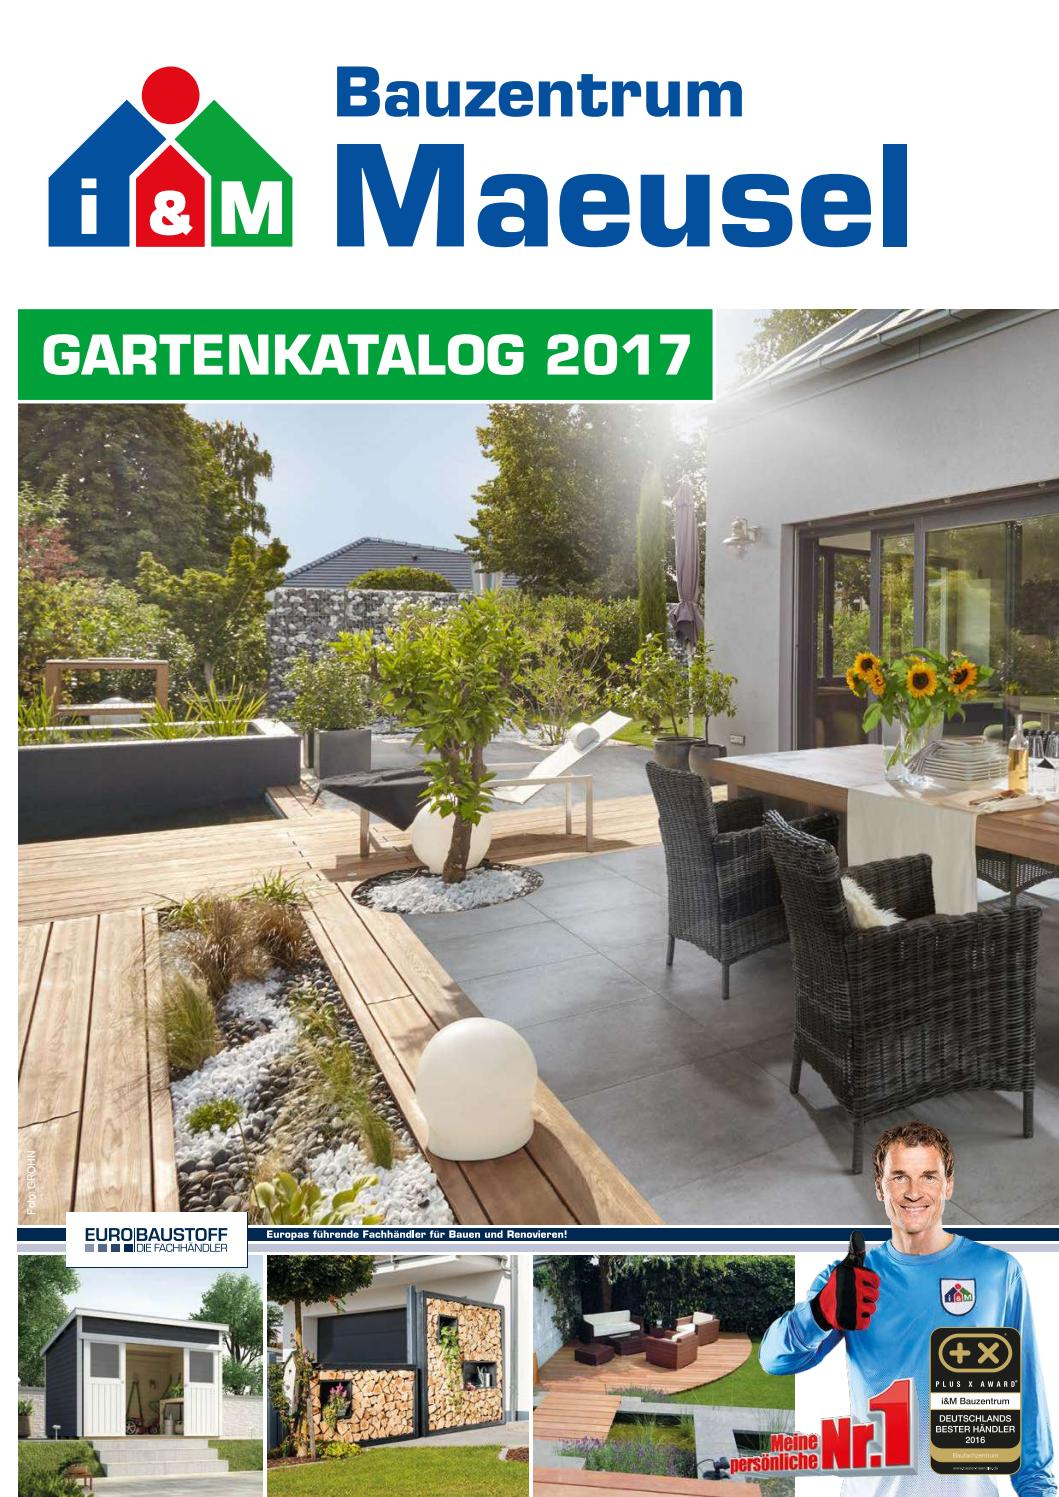 bl tterkatalog maeusel 2017 ilovepdf compressed by maeusel gmbh issuu. Black Bedroom Furniture Sets. Home Design Ideas